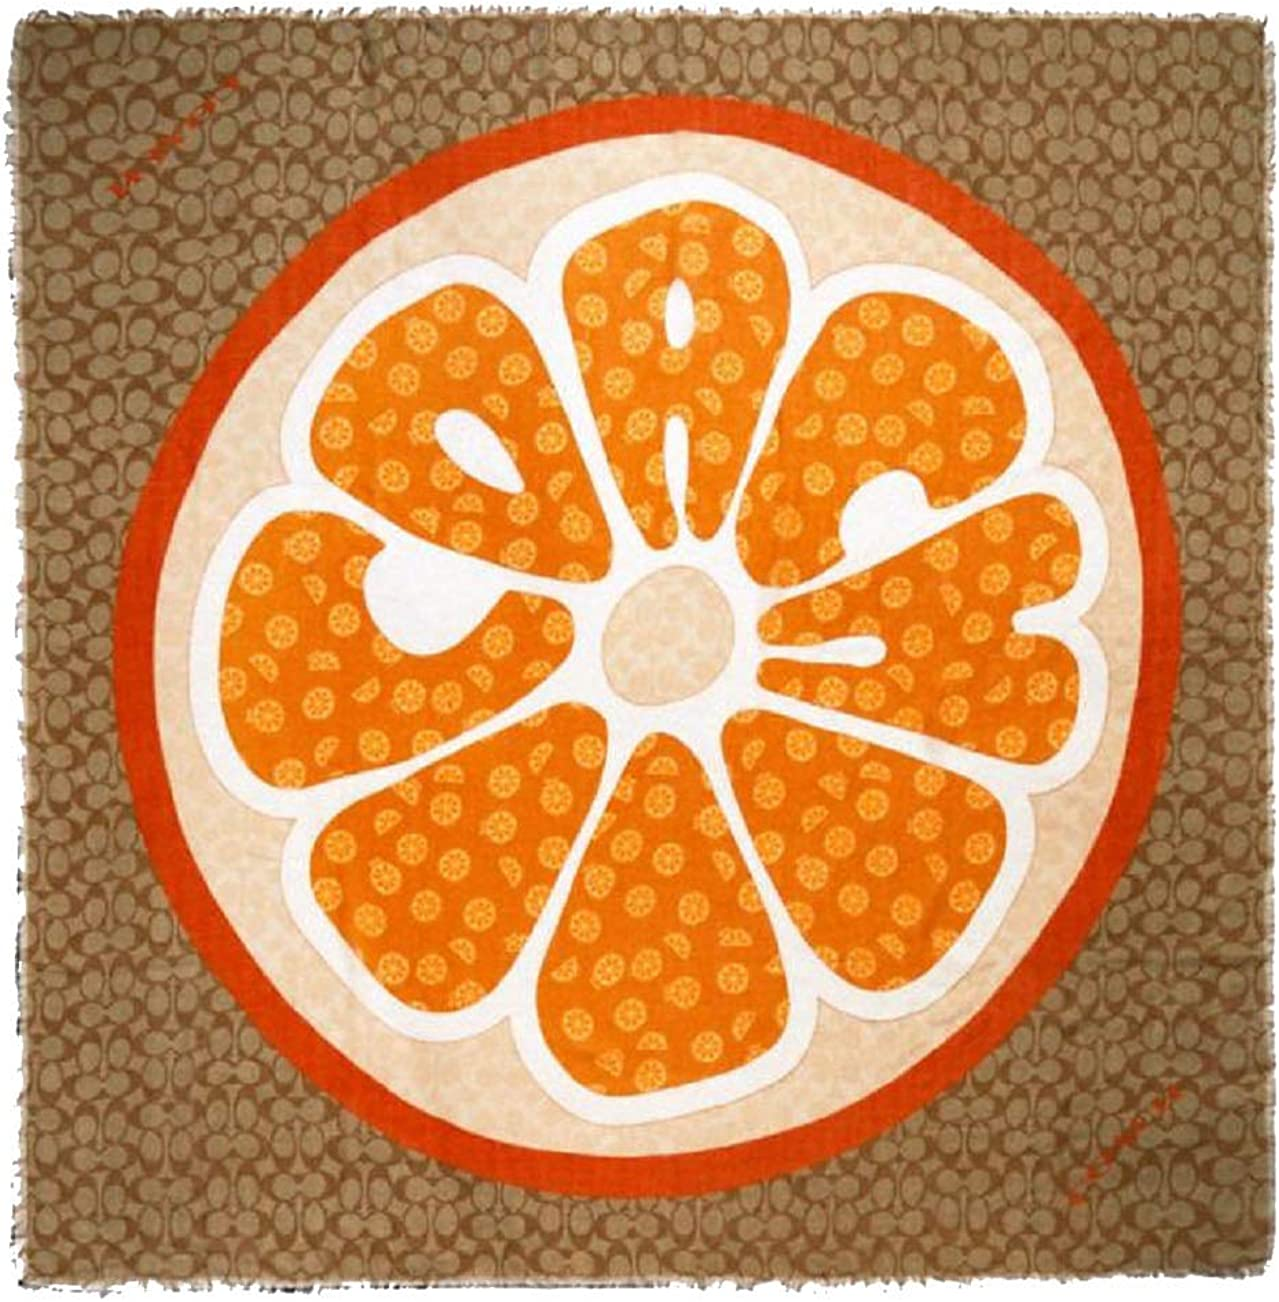 Coach Signature Orange Slice Print Oversized Square Scarf